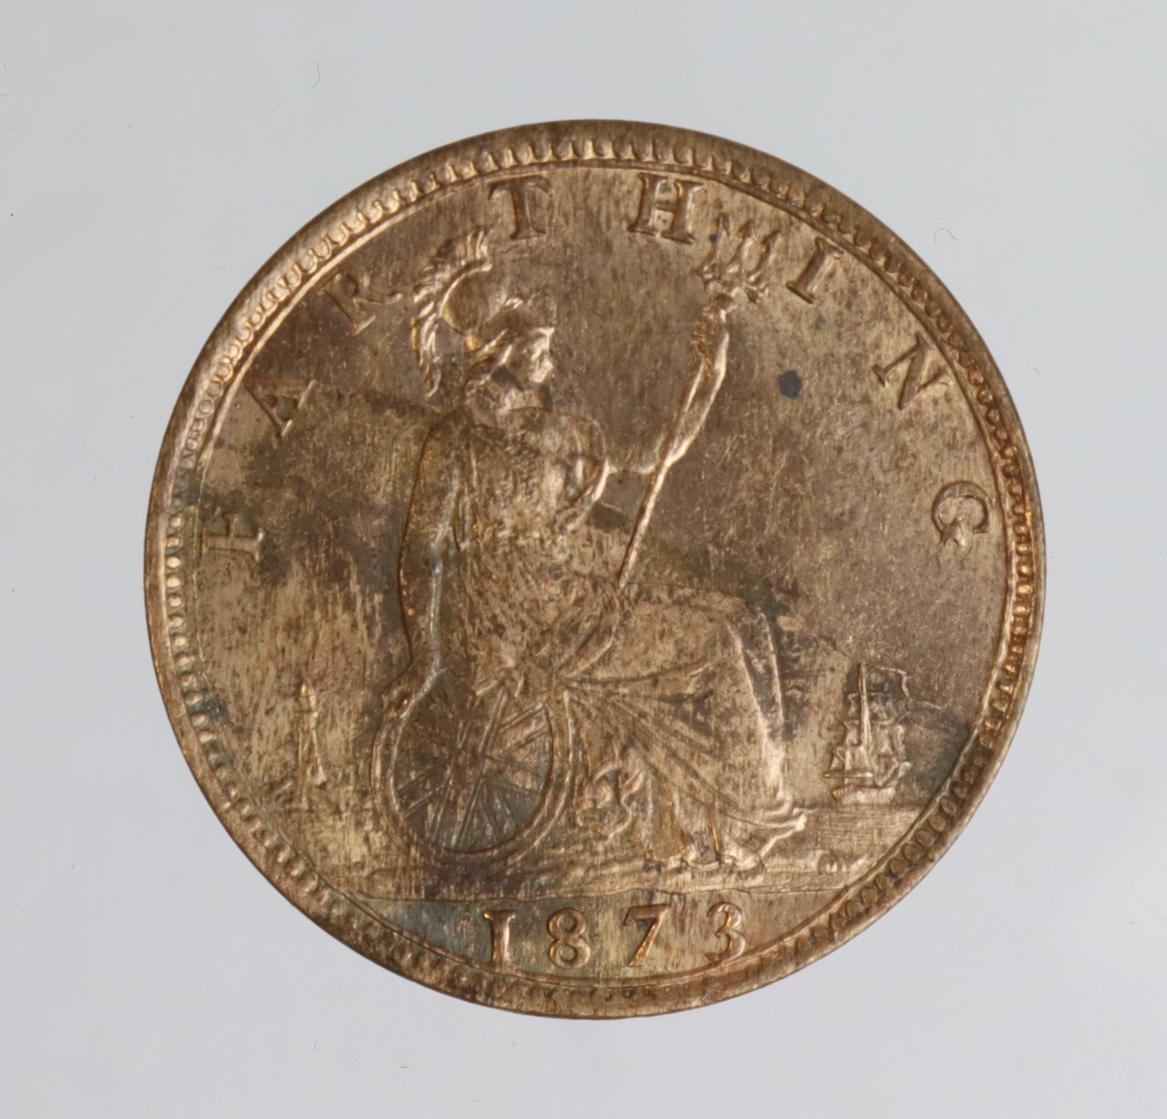 Farthing 1873 near BU, patchy tone rev. - Image 2 of 2